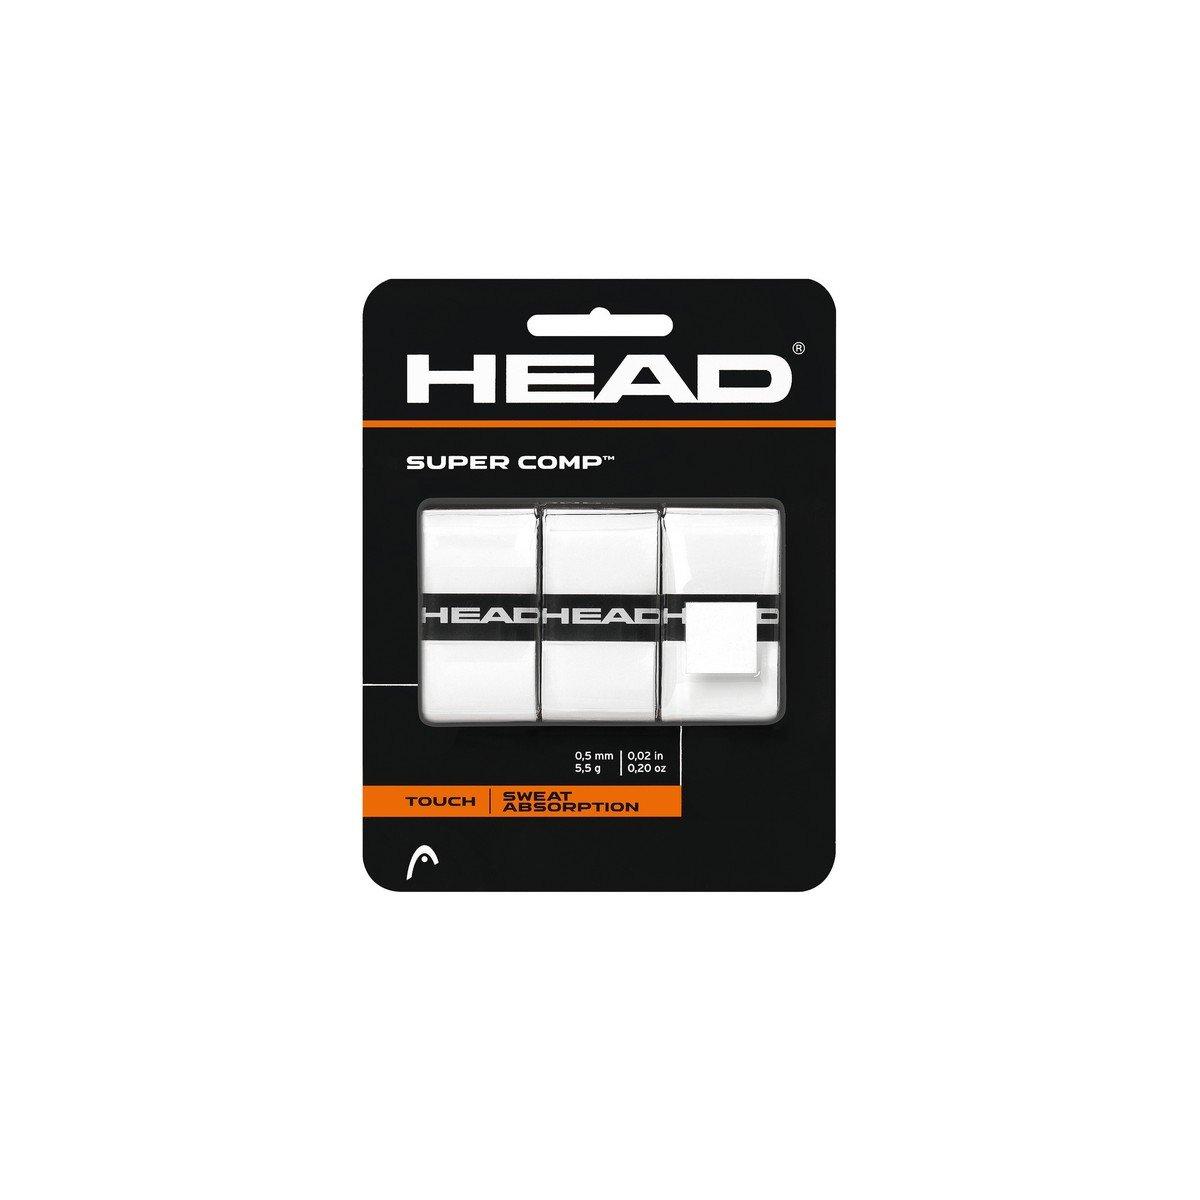 HEAD Super Comp Overgrip, Black, 3-Pack 285088-BLK